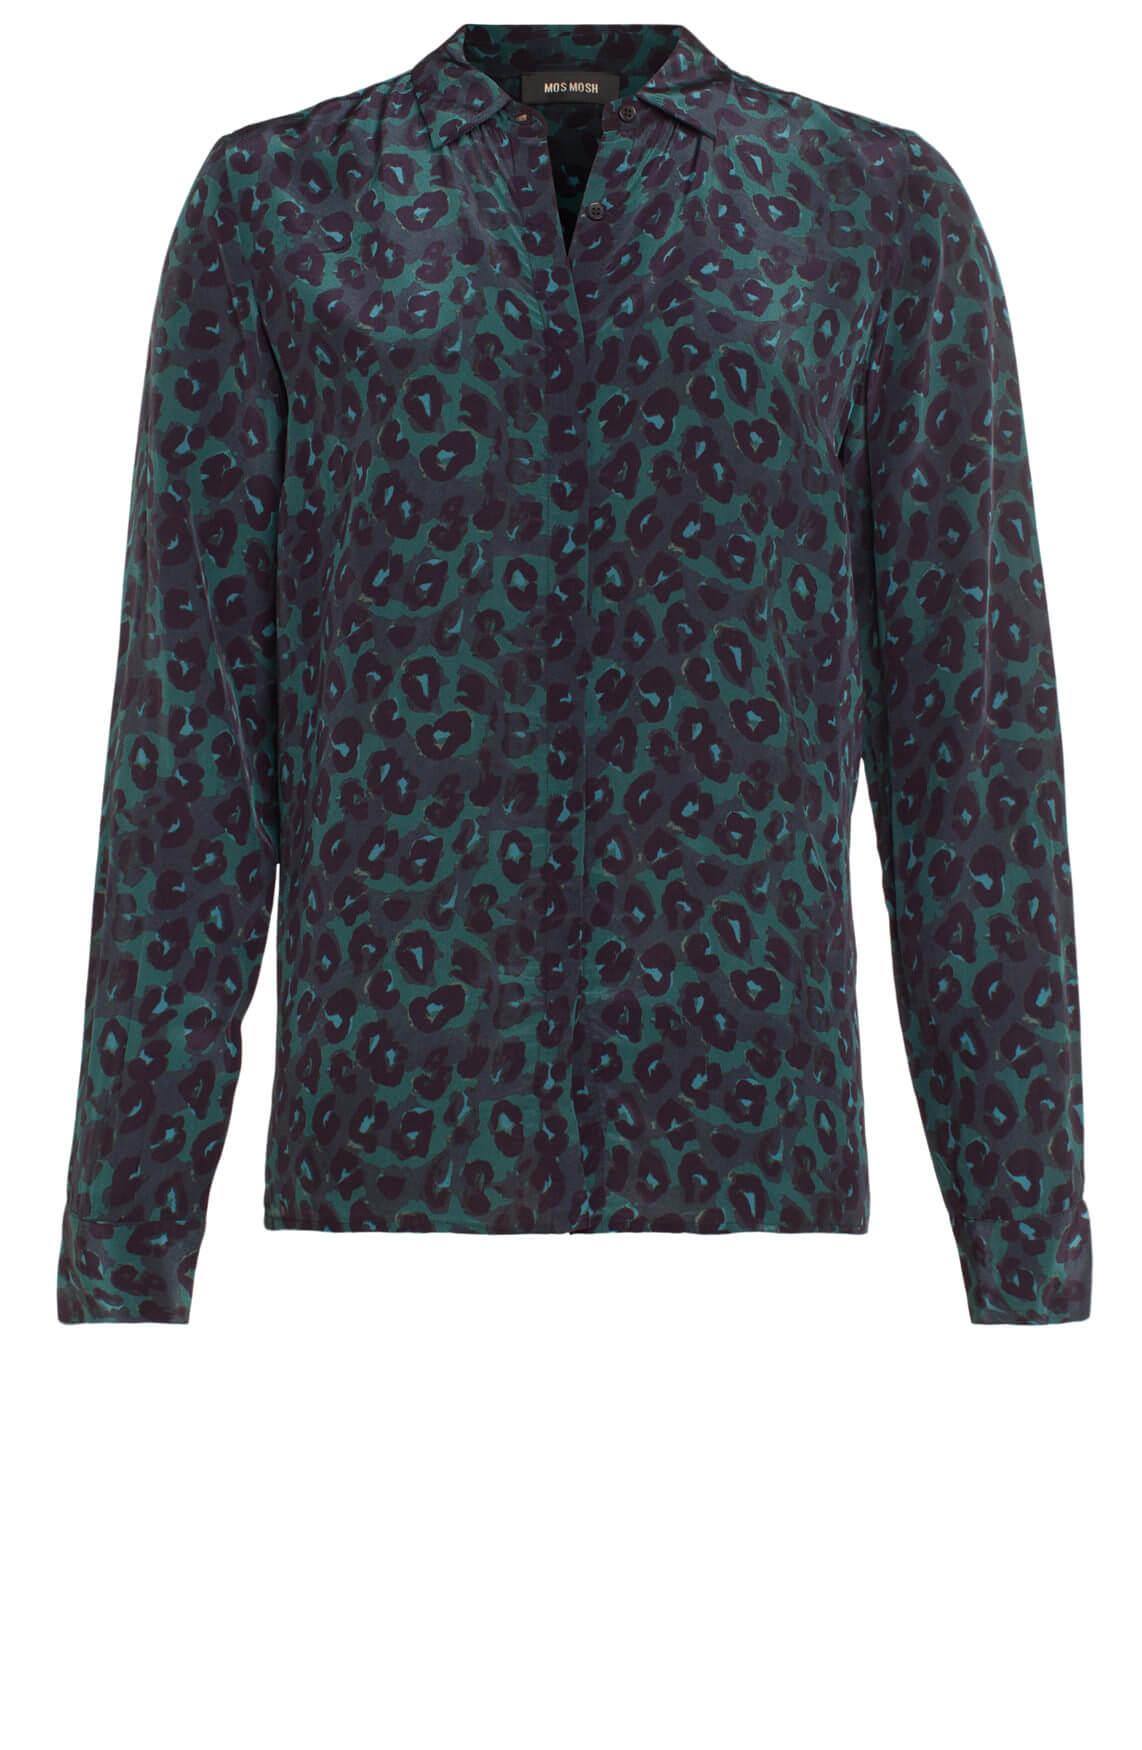 Mos Mosh Dames Taylor blouse met panterprint groen